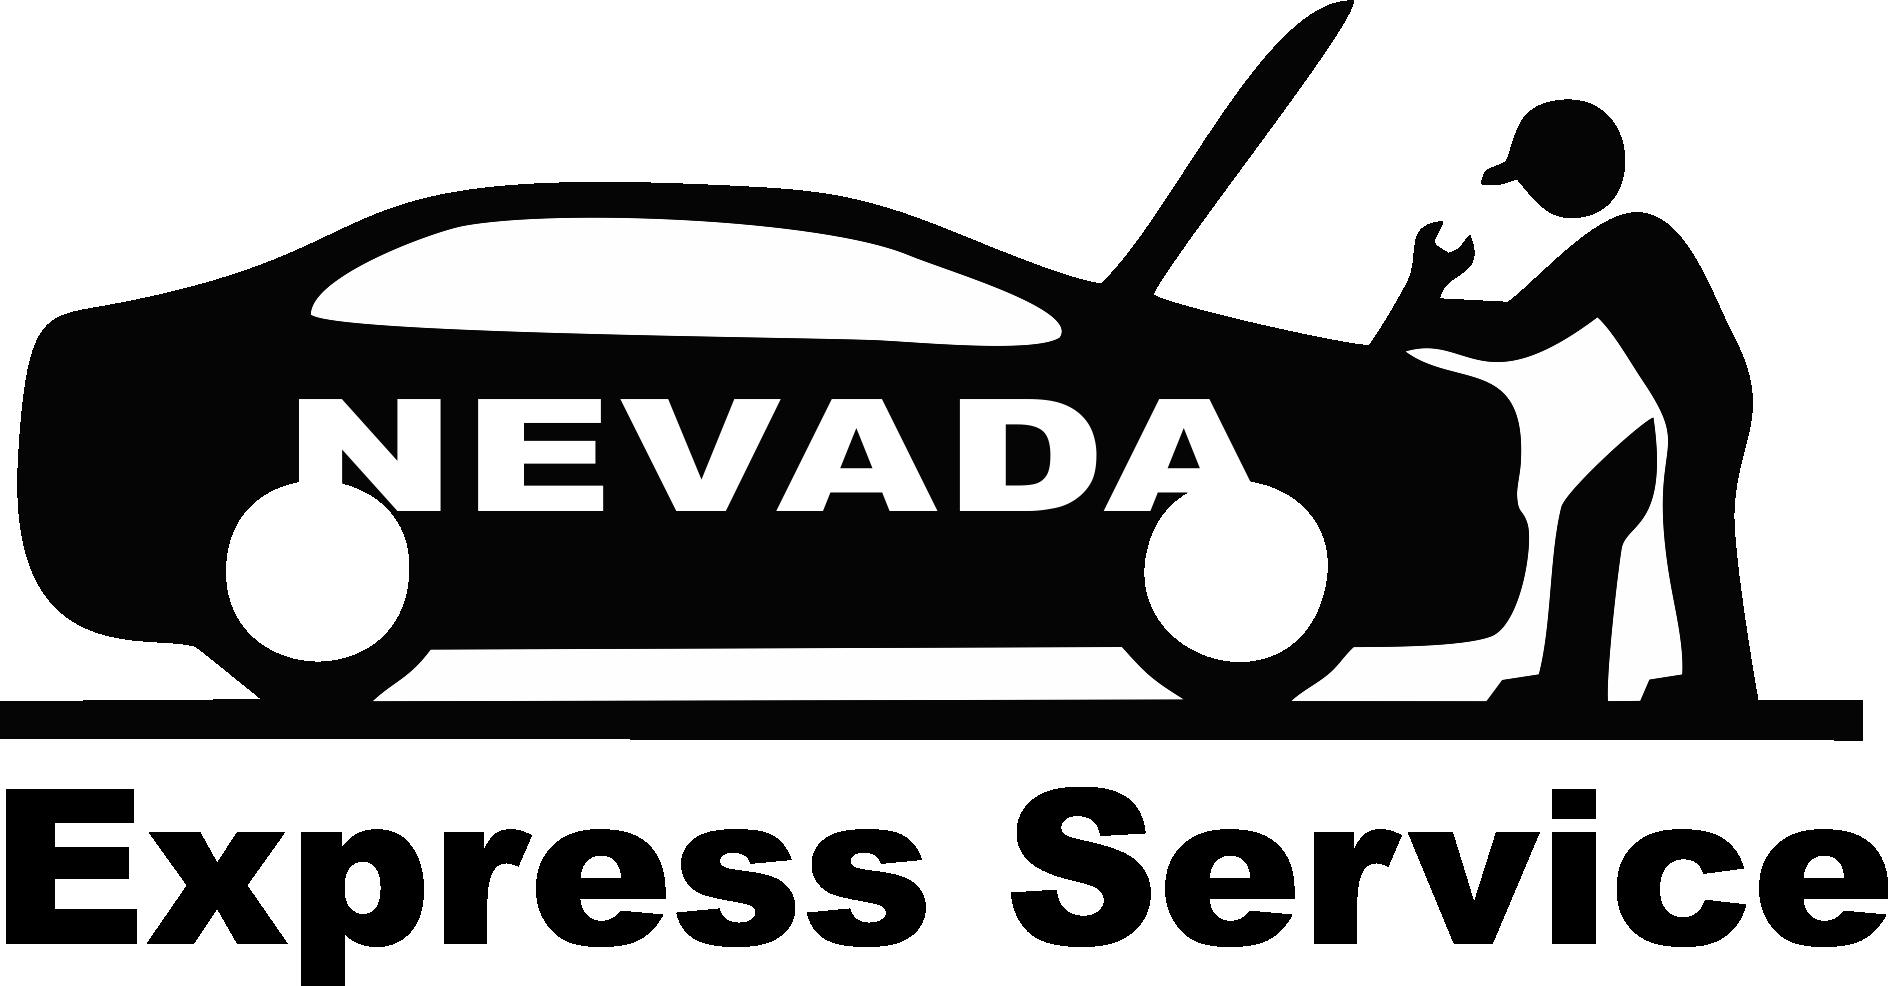 Neveada Express Service